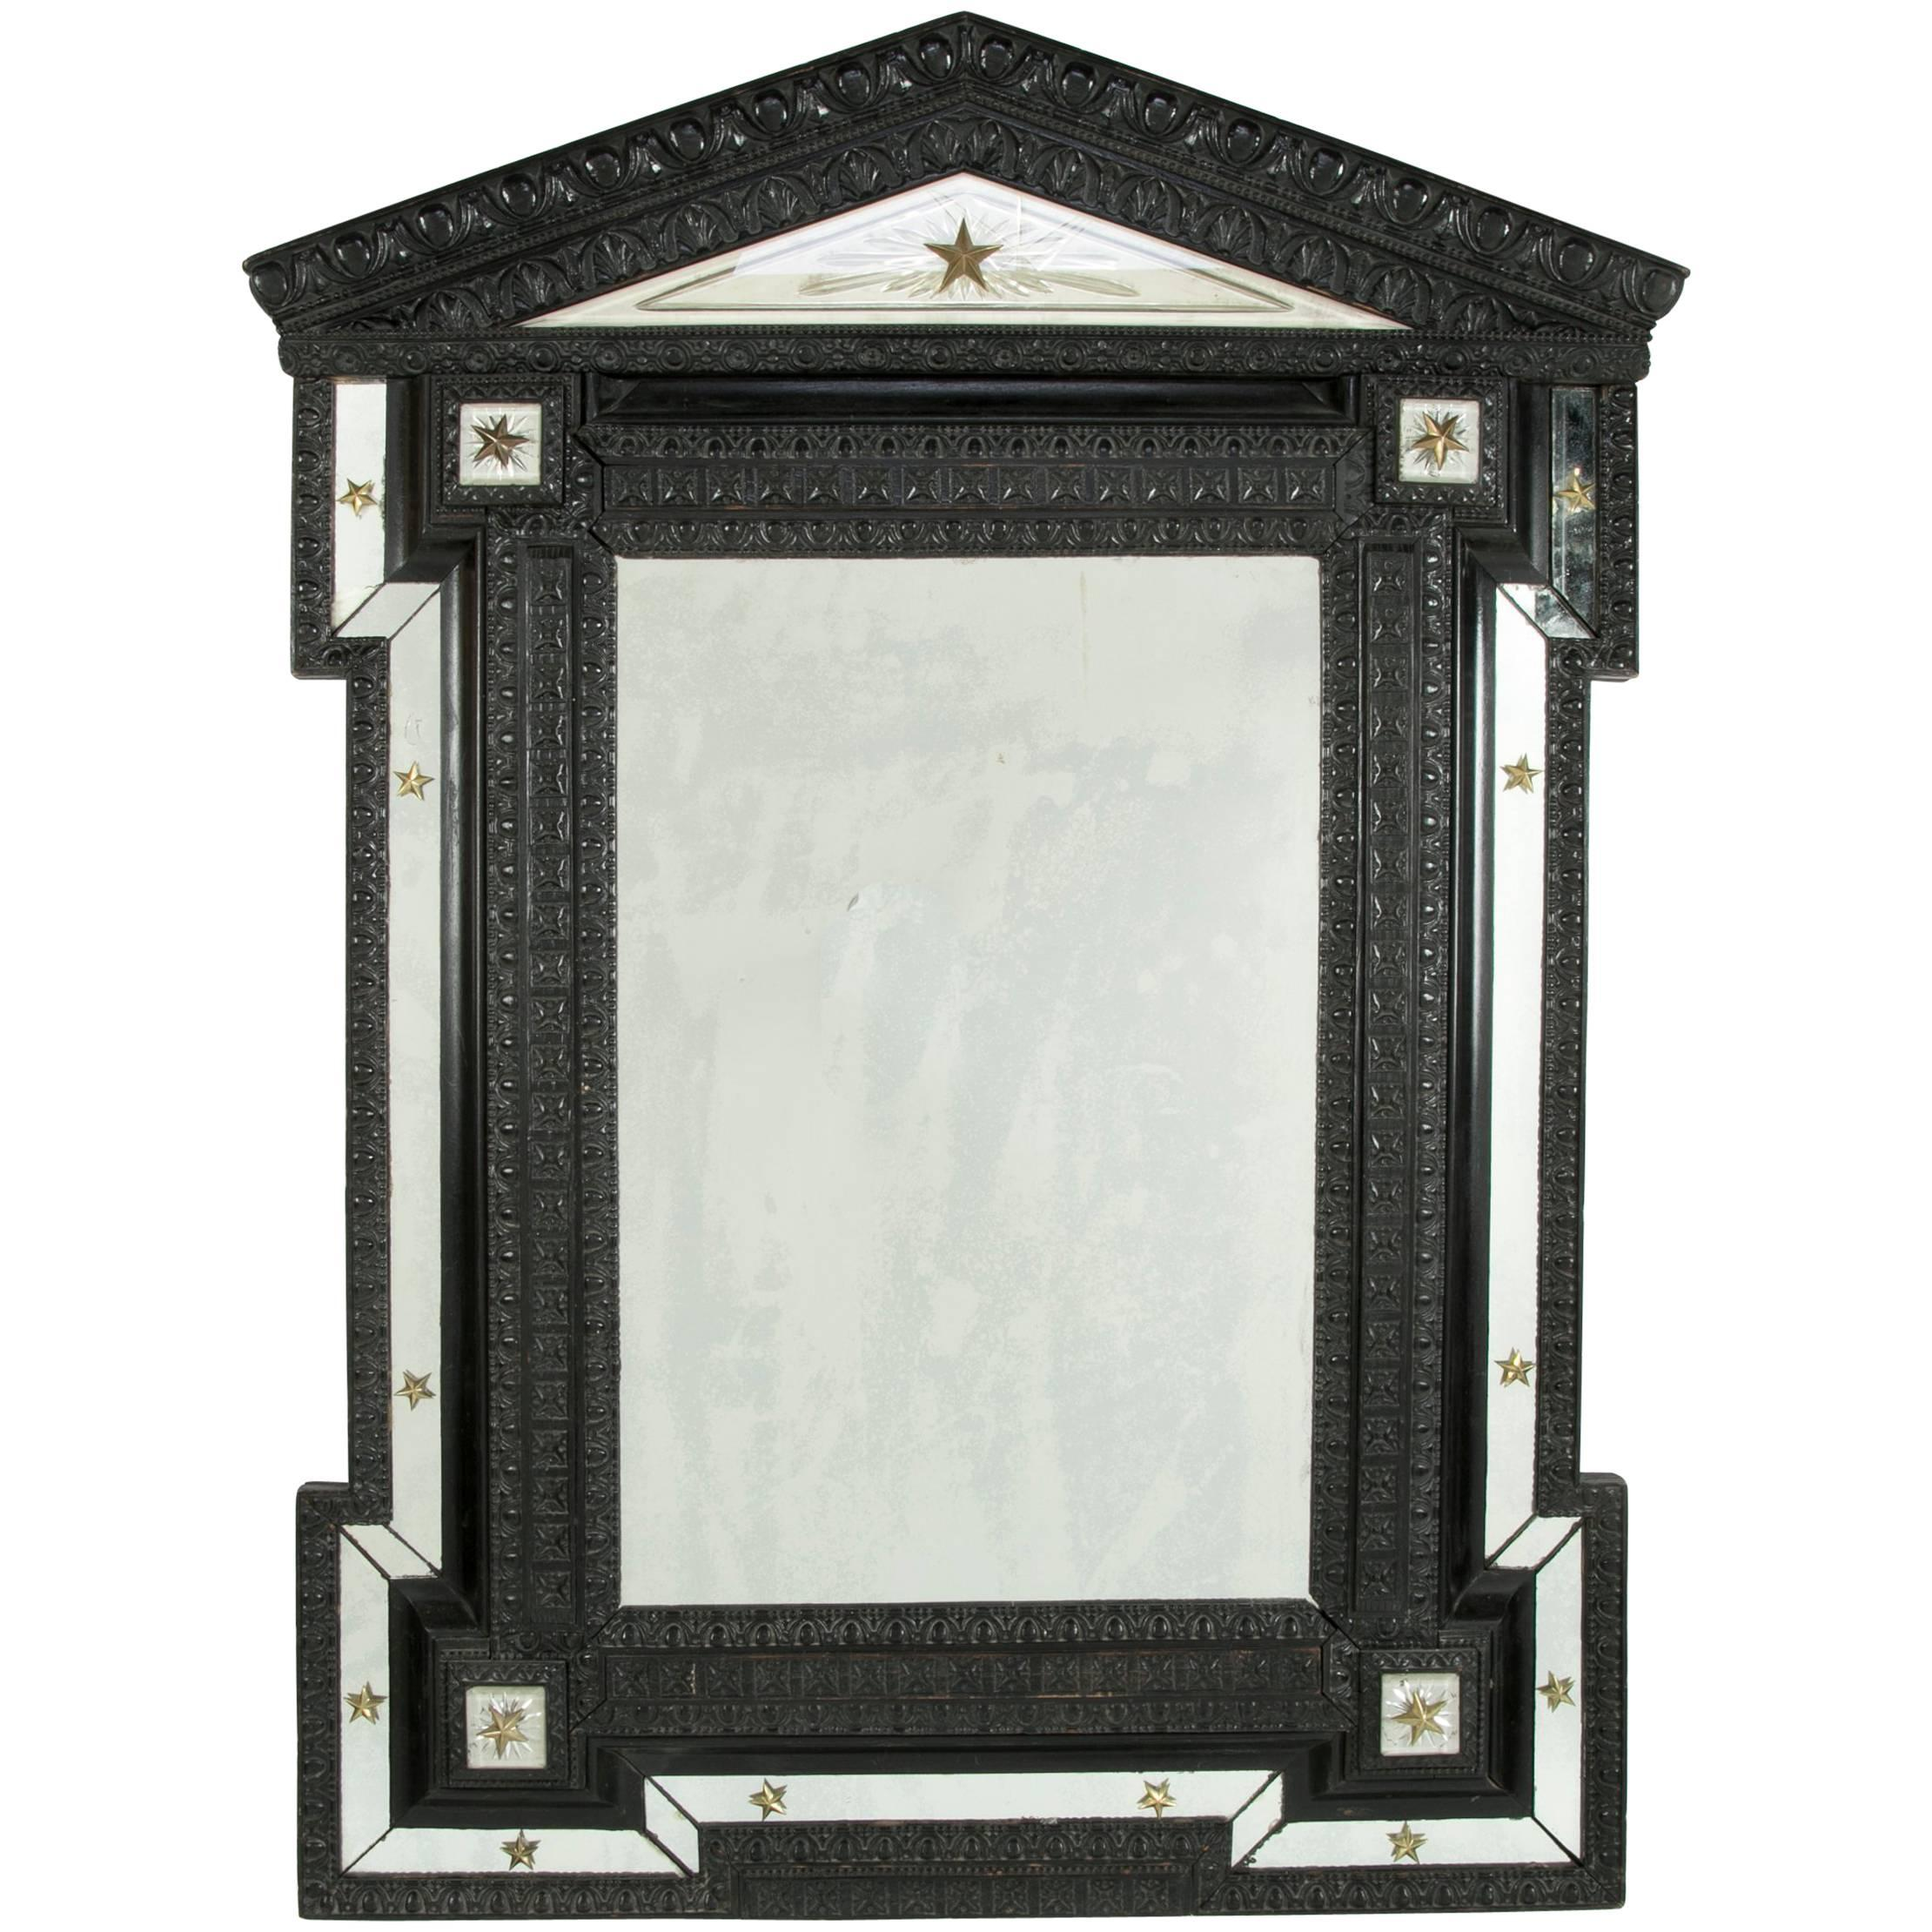 19th Century Ebonized Flemish and Cut-Glass Mirror